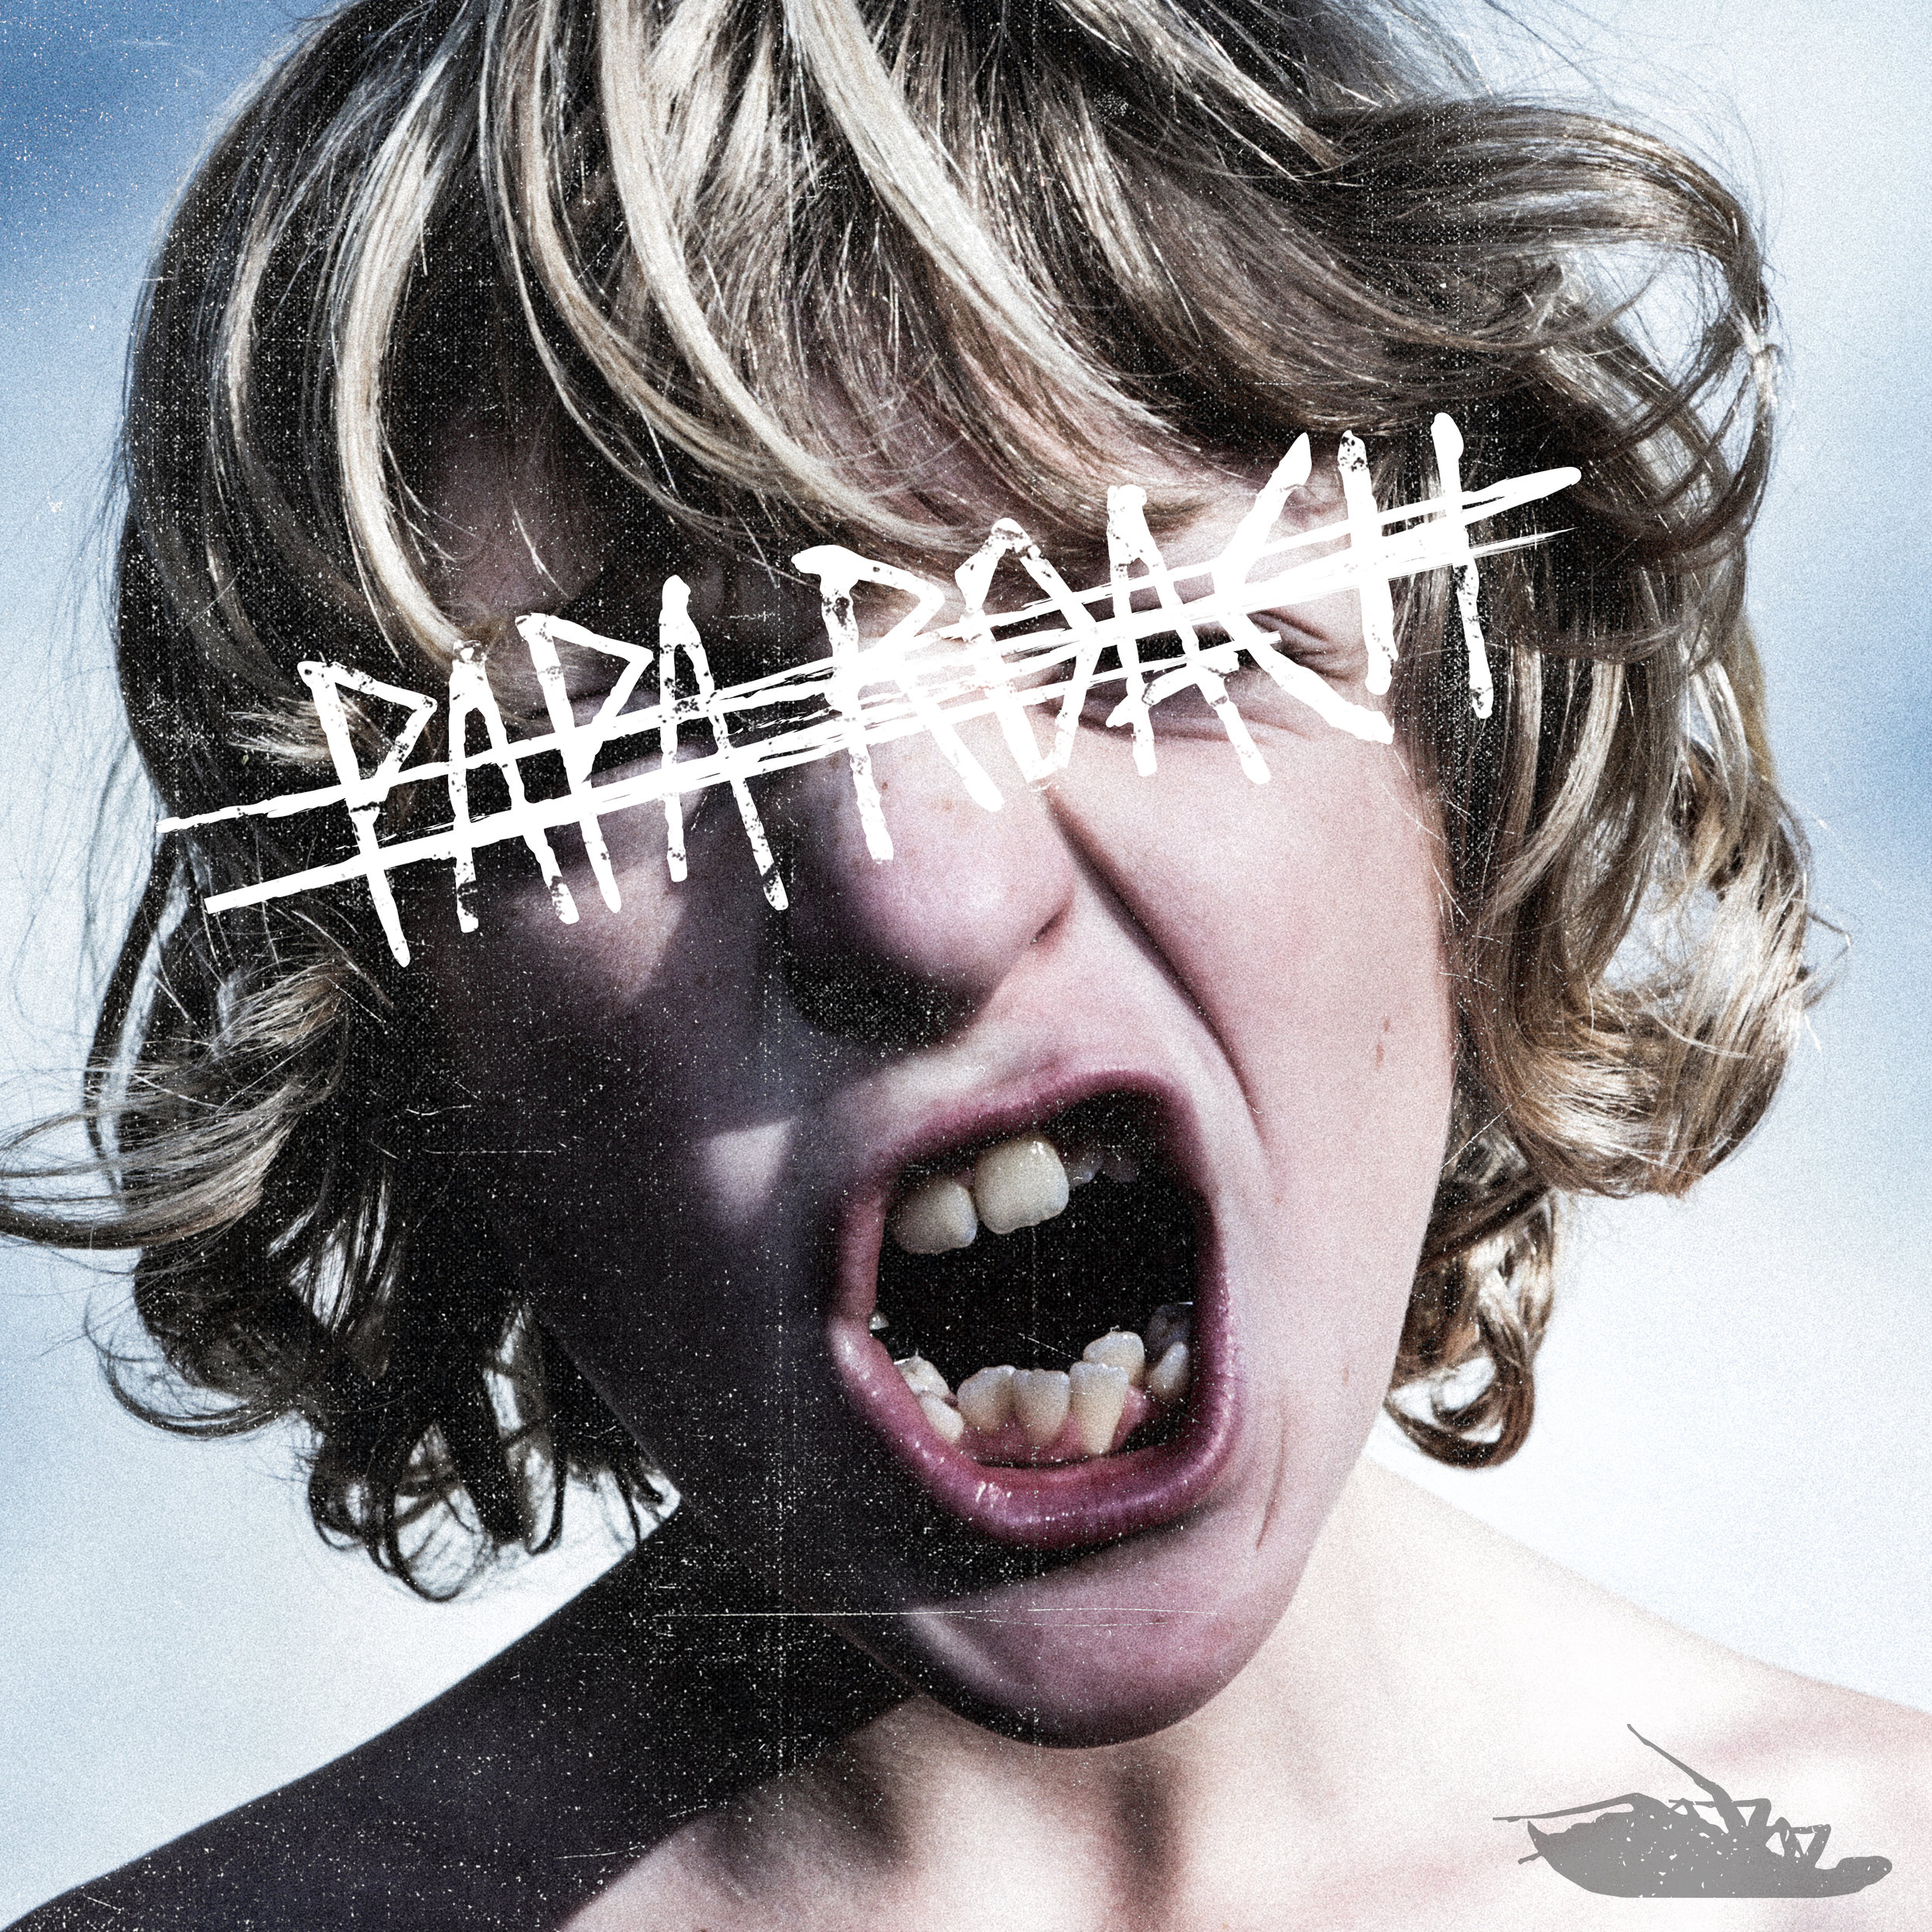 PAR-COVER-FINAL (2).jpg